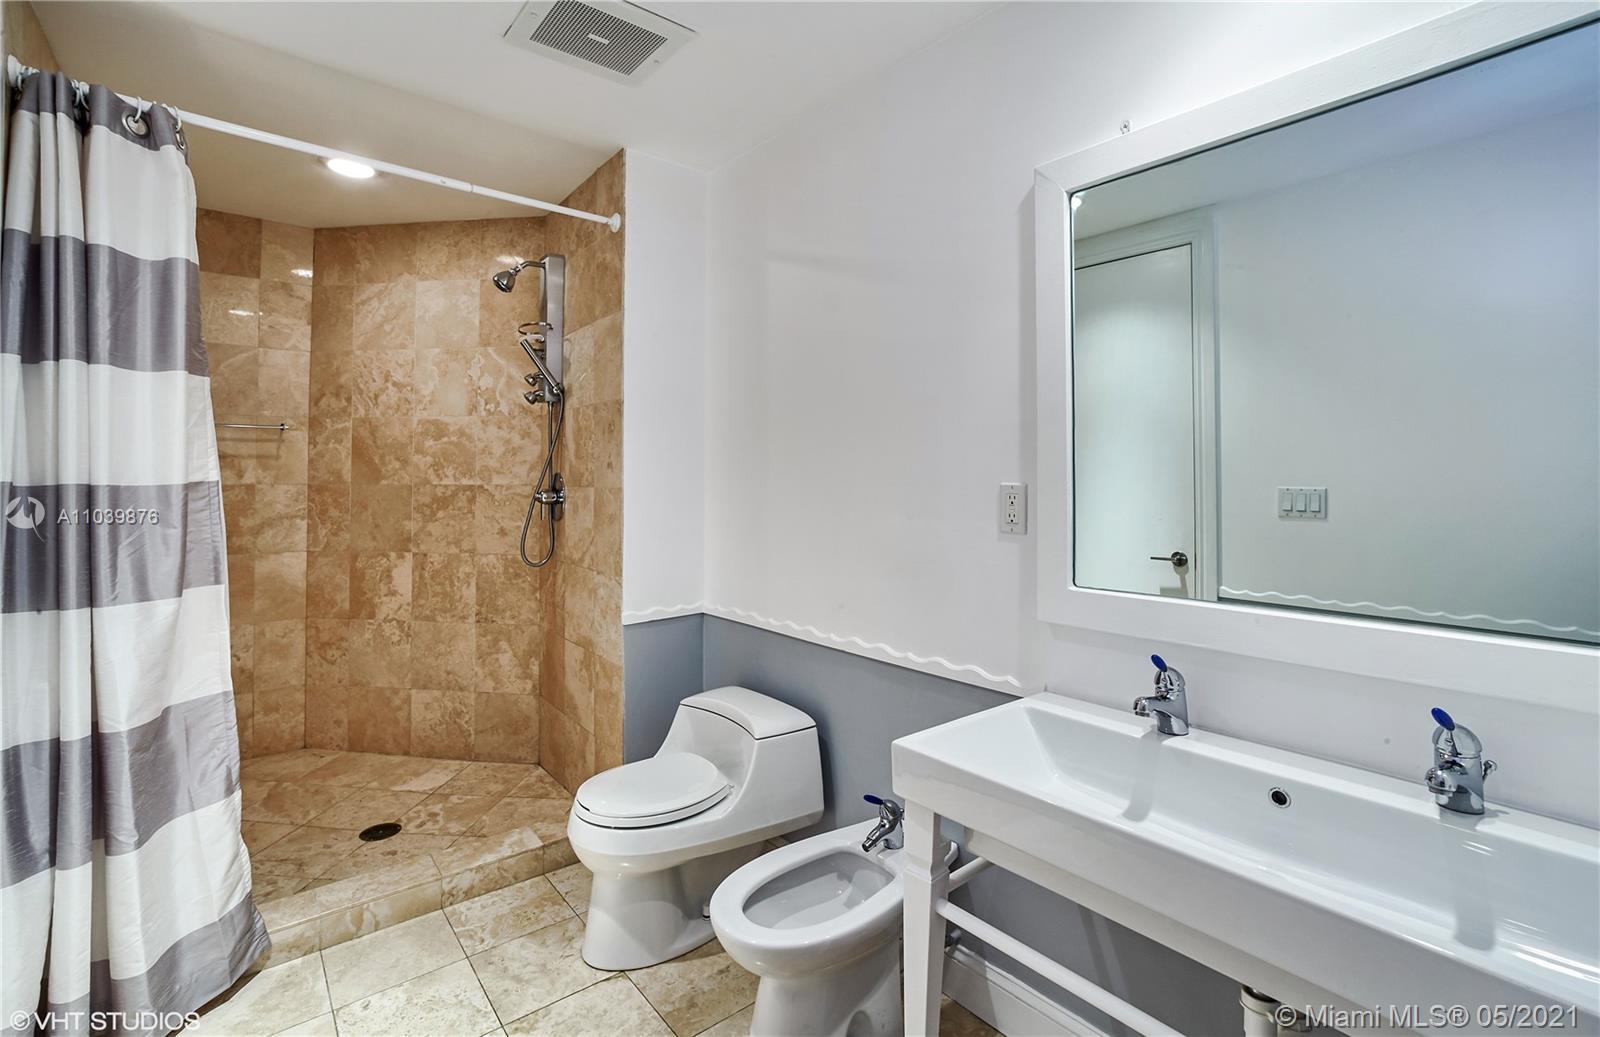 Photo of 10225 Collins Ave #1703, Bal Harbour, Florida, 33154 - Third bedroom with en-suite bathroom overlooking the beach, Atlantic Ocean and Haulover Inlet.